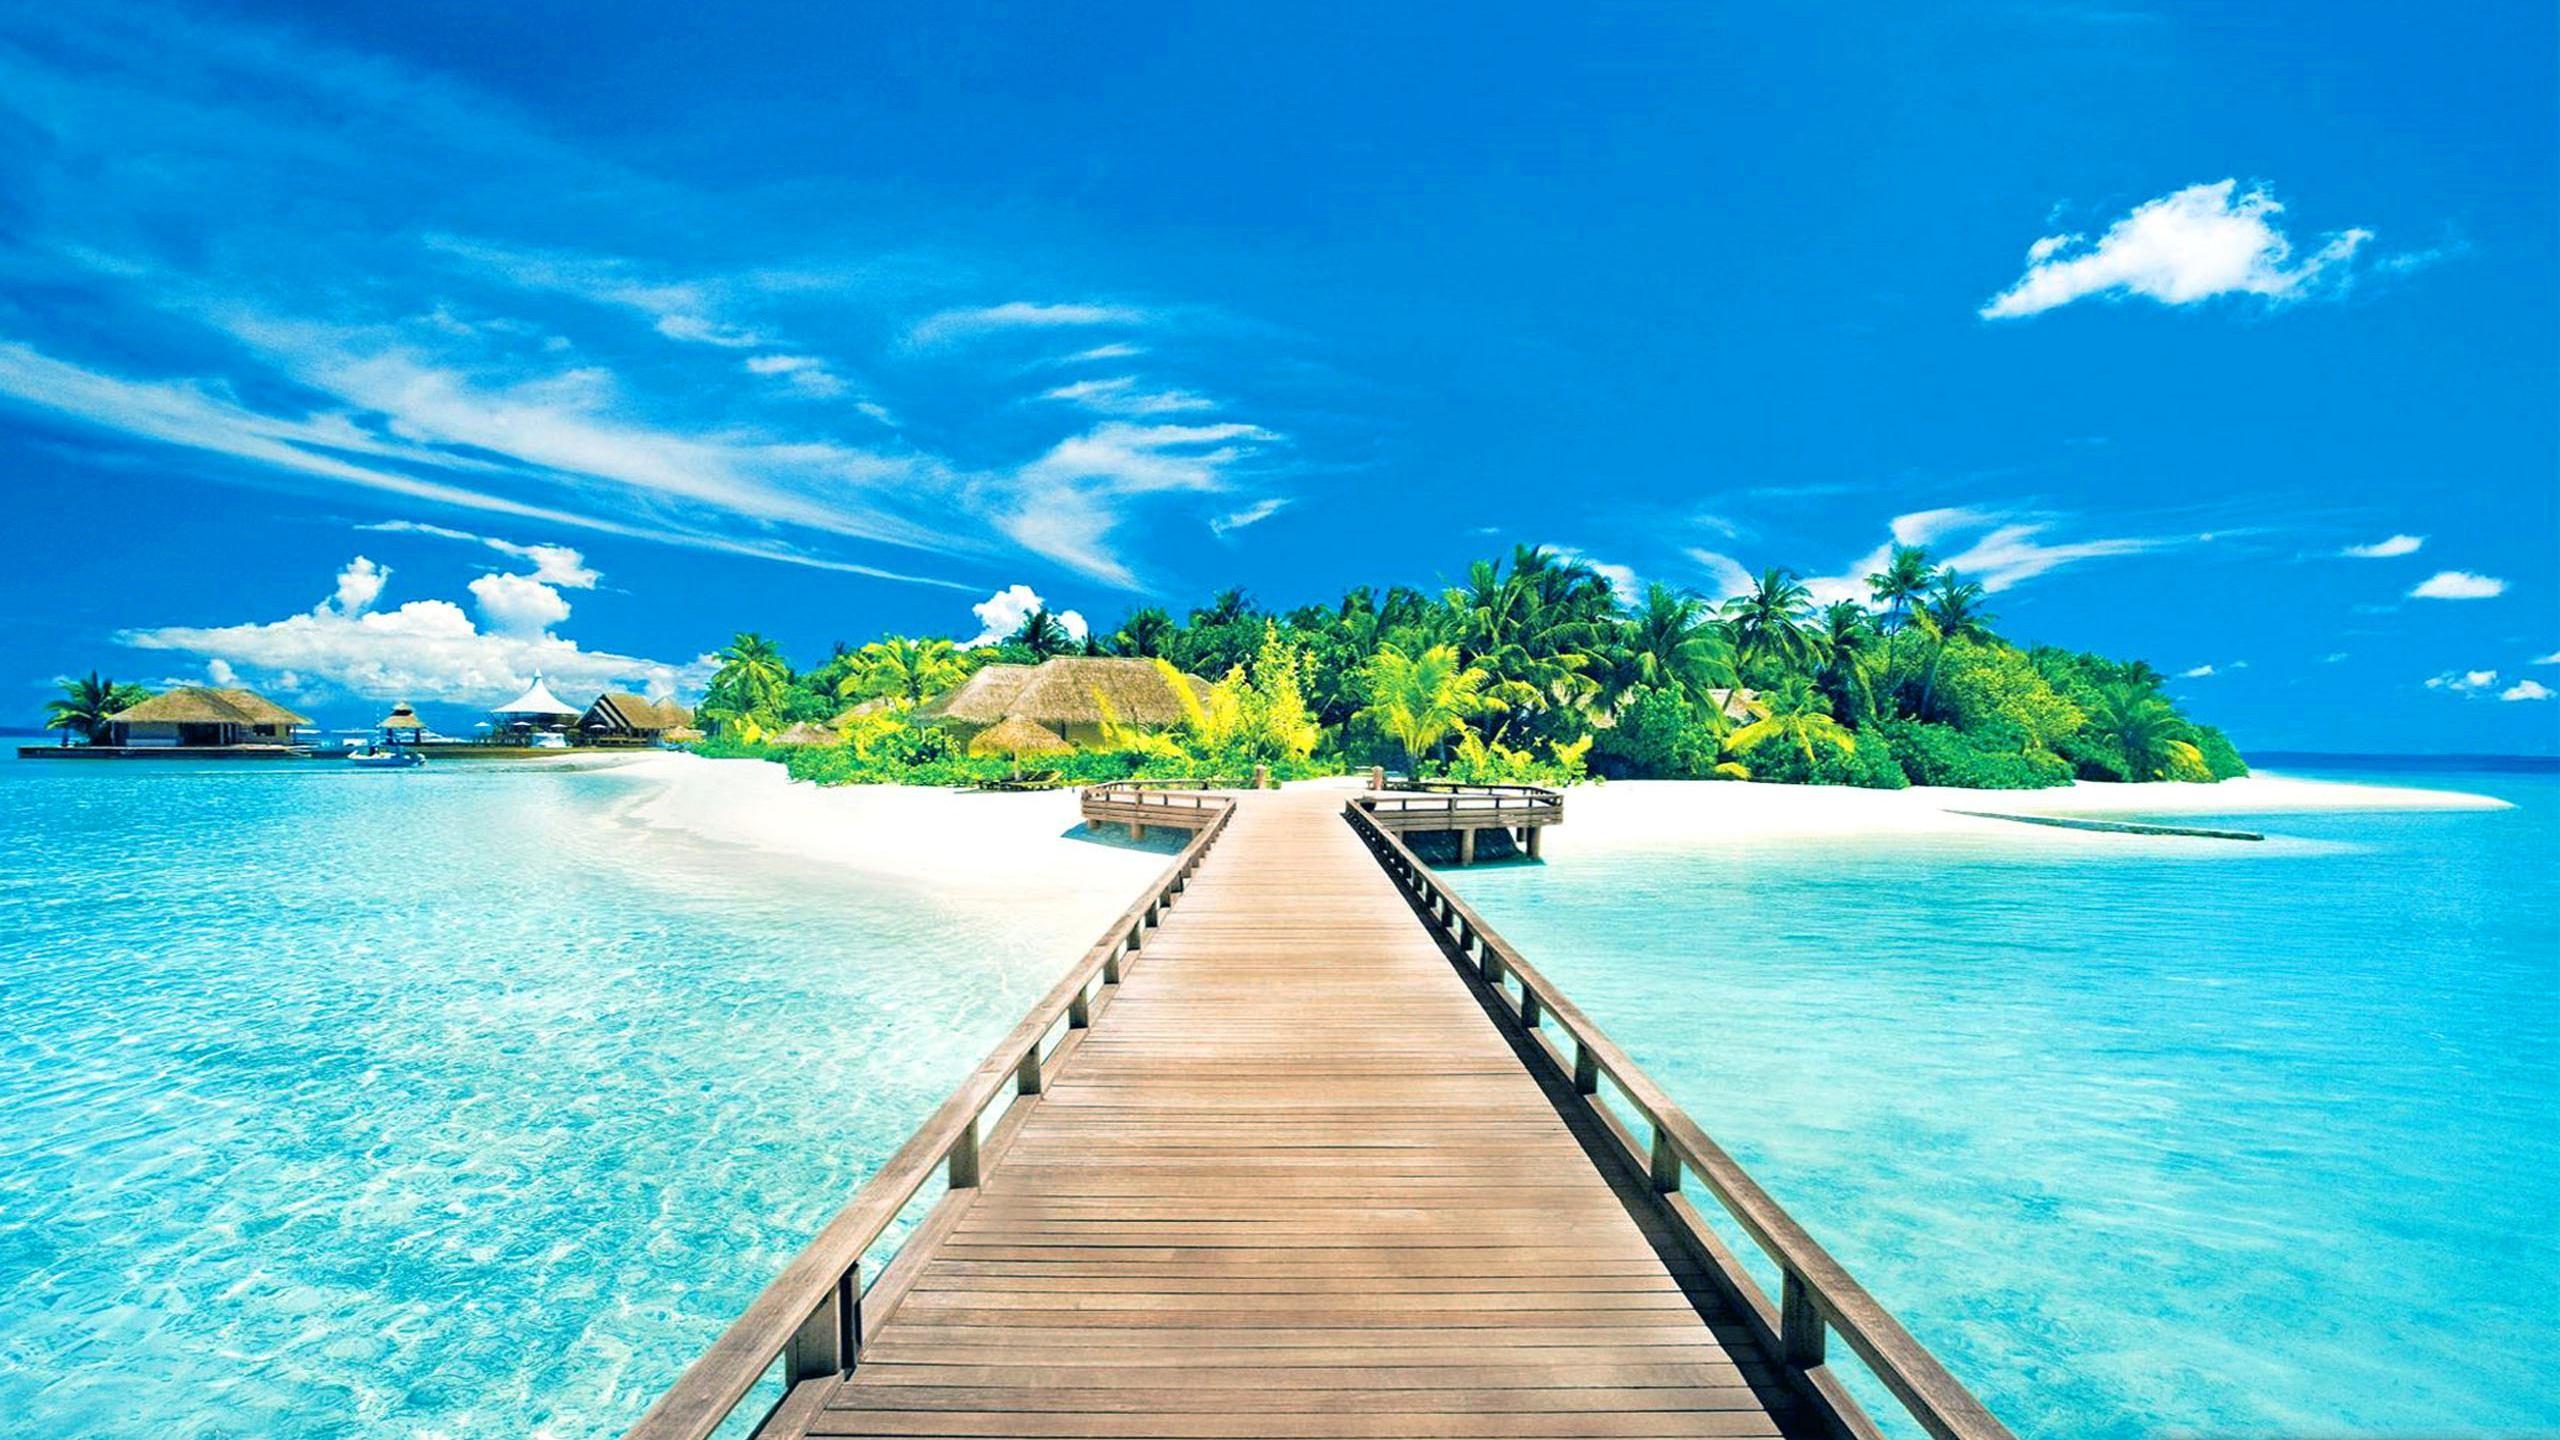 Tropical Island Hd | wallpaper.